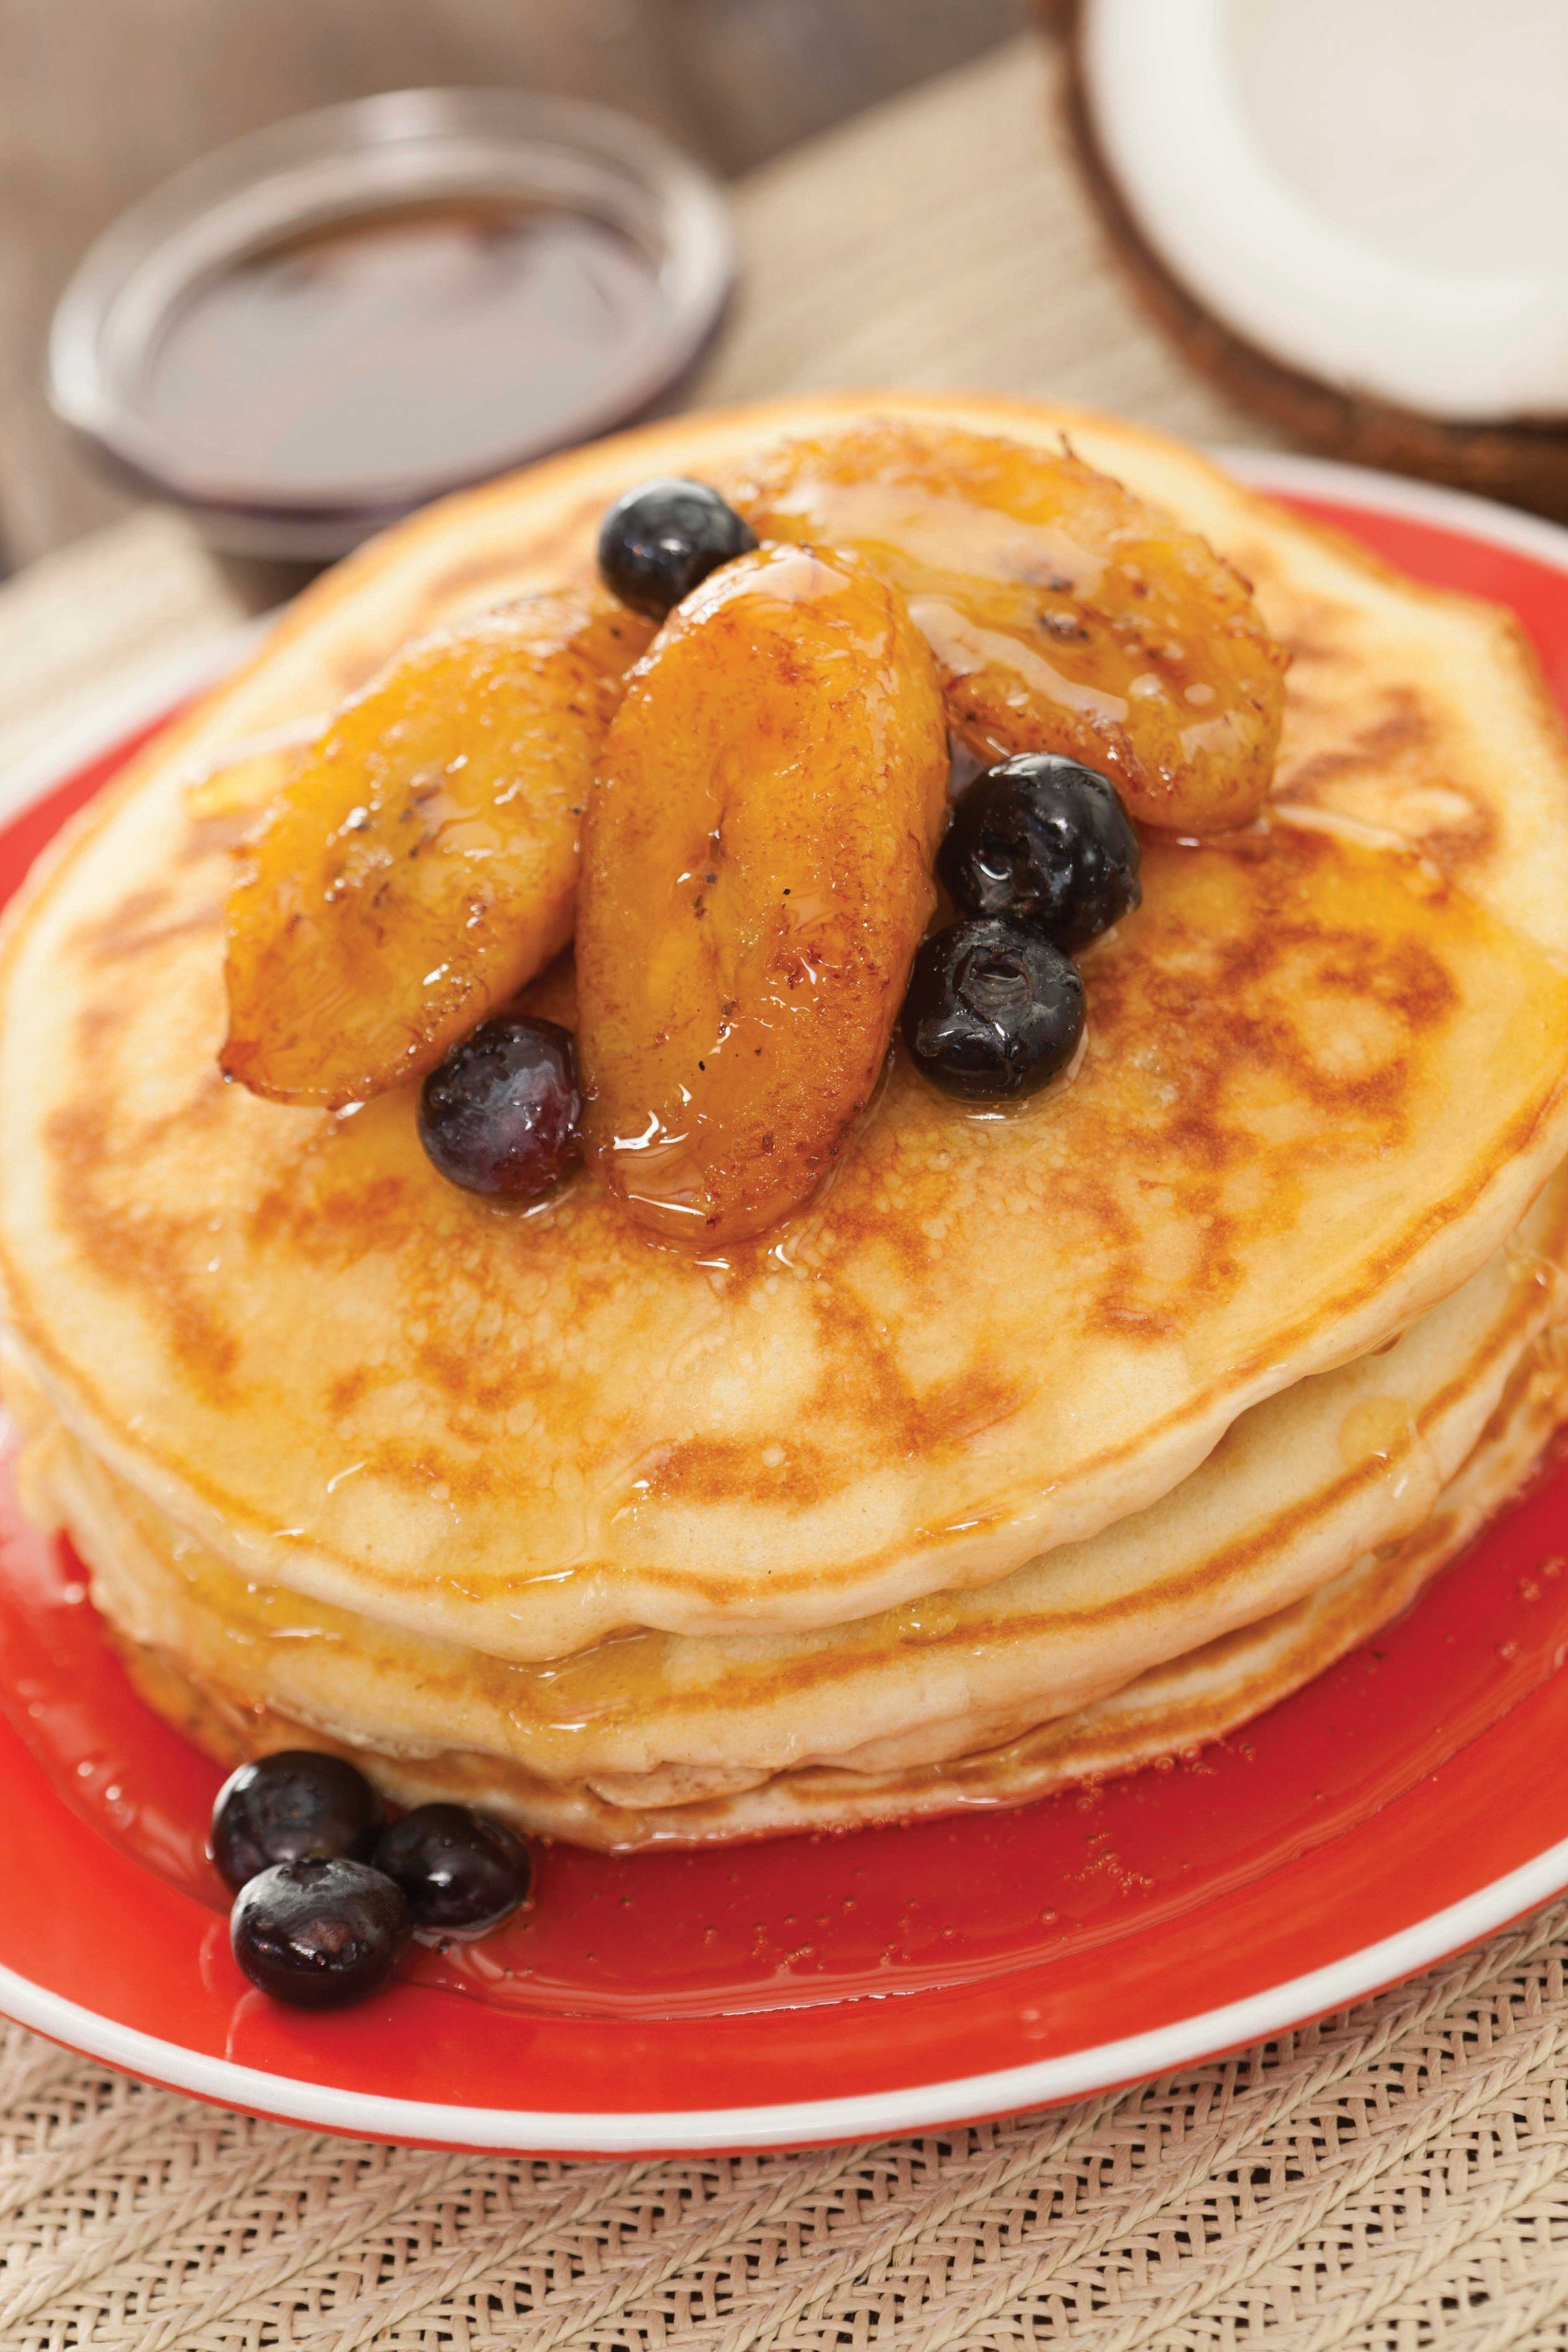 Photo courtesy of MIC Food  ®  (Use of BIG BANANA® Sweet Plantain Slices)